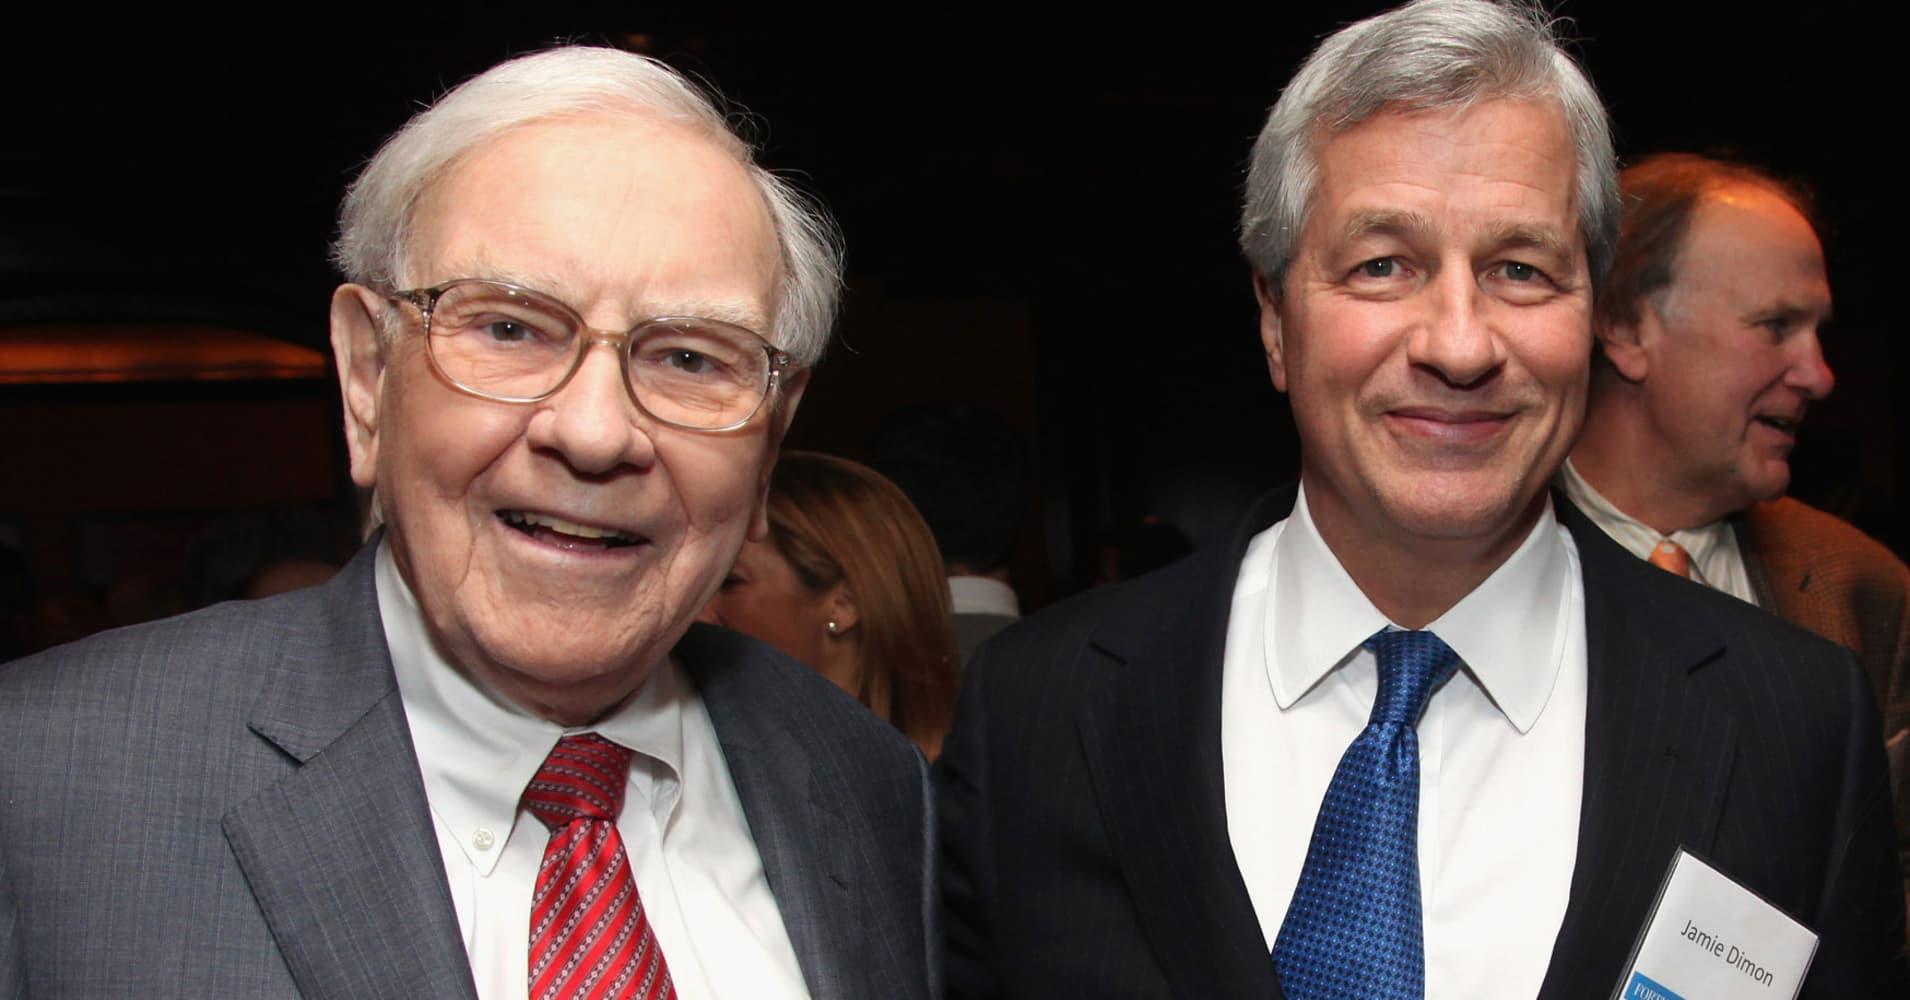 The Ceo Warren Buffett Turns To For Wisdom Jpmorgan 39 S